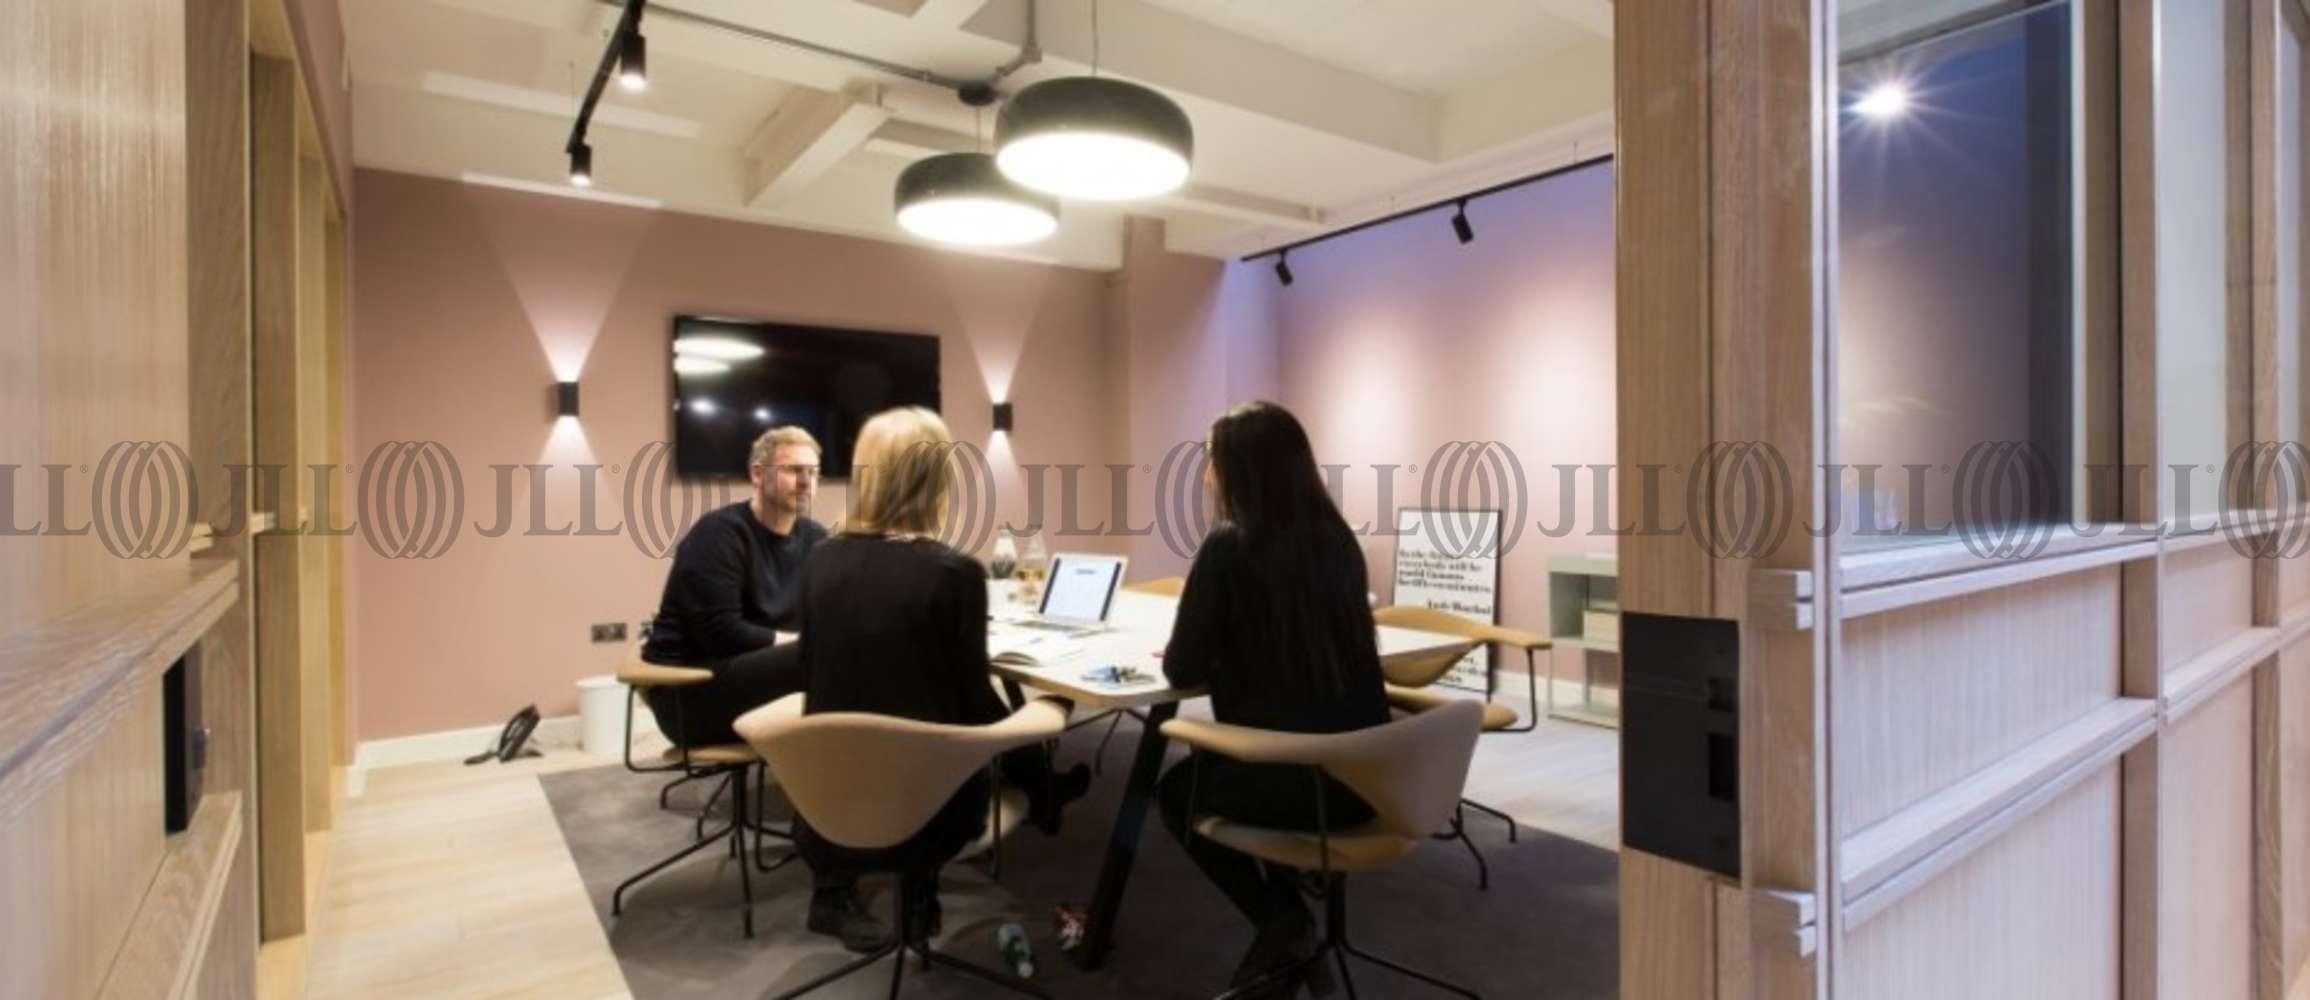 Serviced office London, W1W 5PL - The Smith Building, Great Portland Street - 407